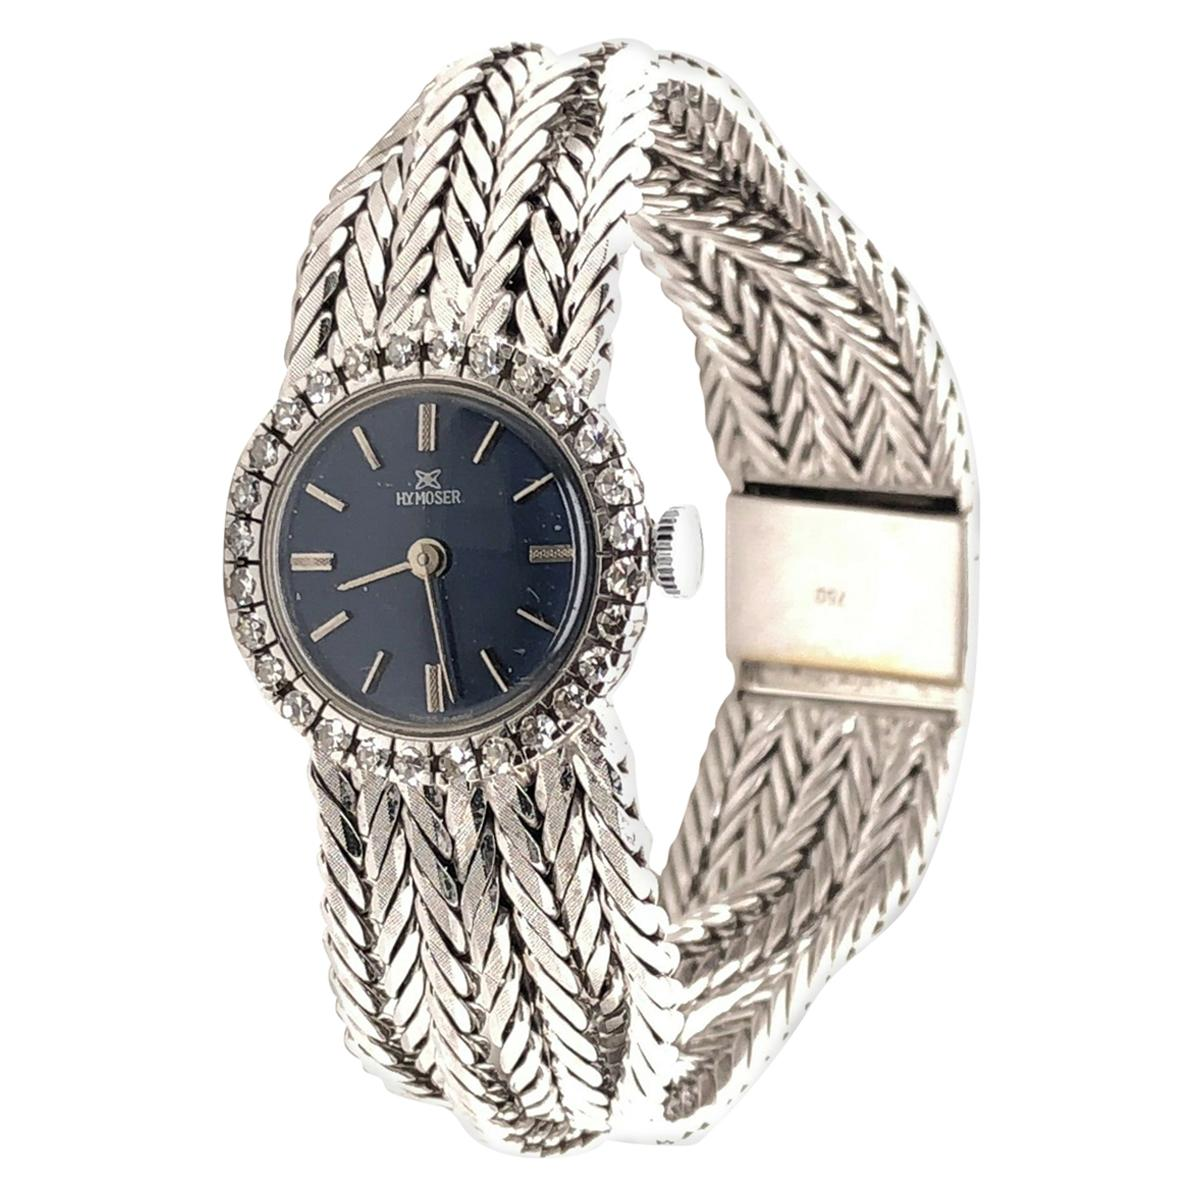 18 Karat White Gold HY MOSER Watch with Diamonds